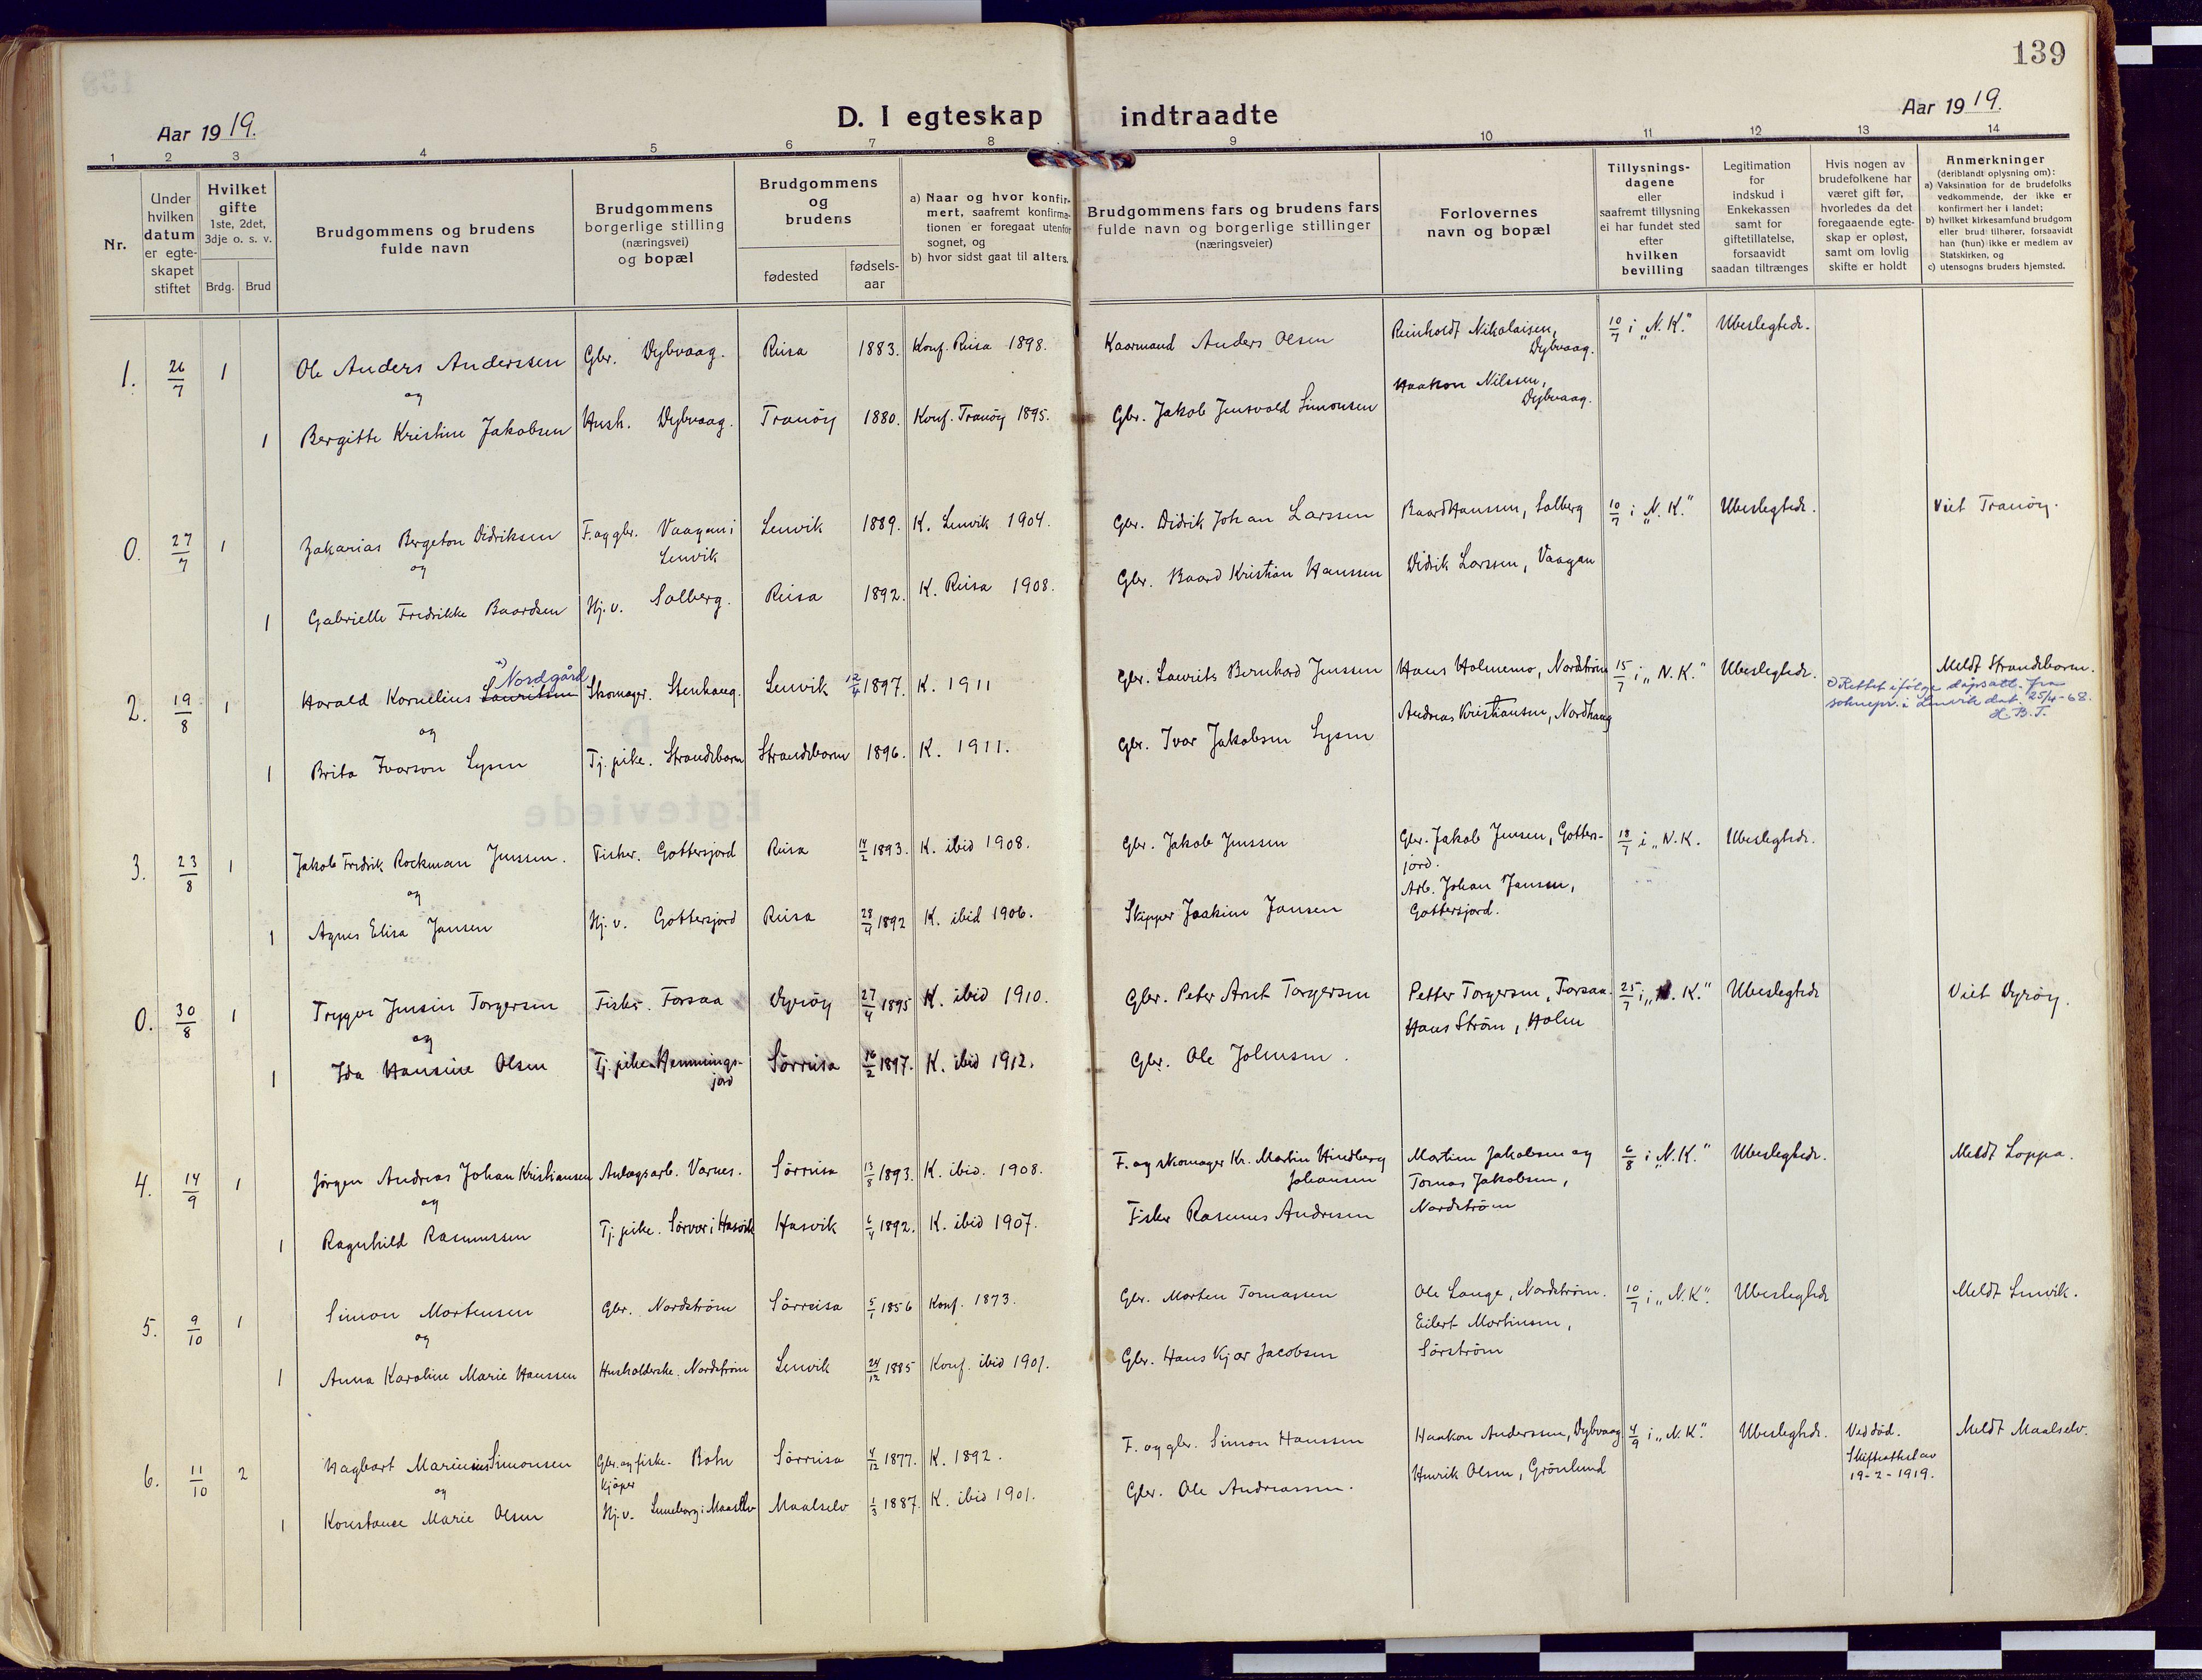 SATØ, Tranøy sokneprestkontor, I/Ia/Iaa/L0015kirke: Ministerialbok nr. 15, 1919-1928, s. 139